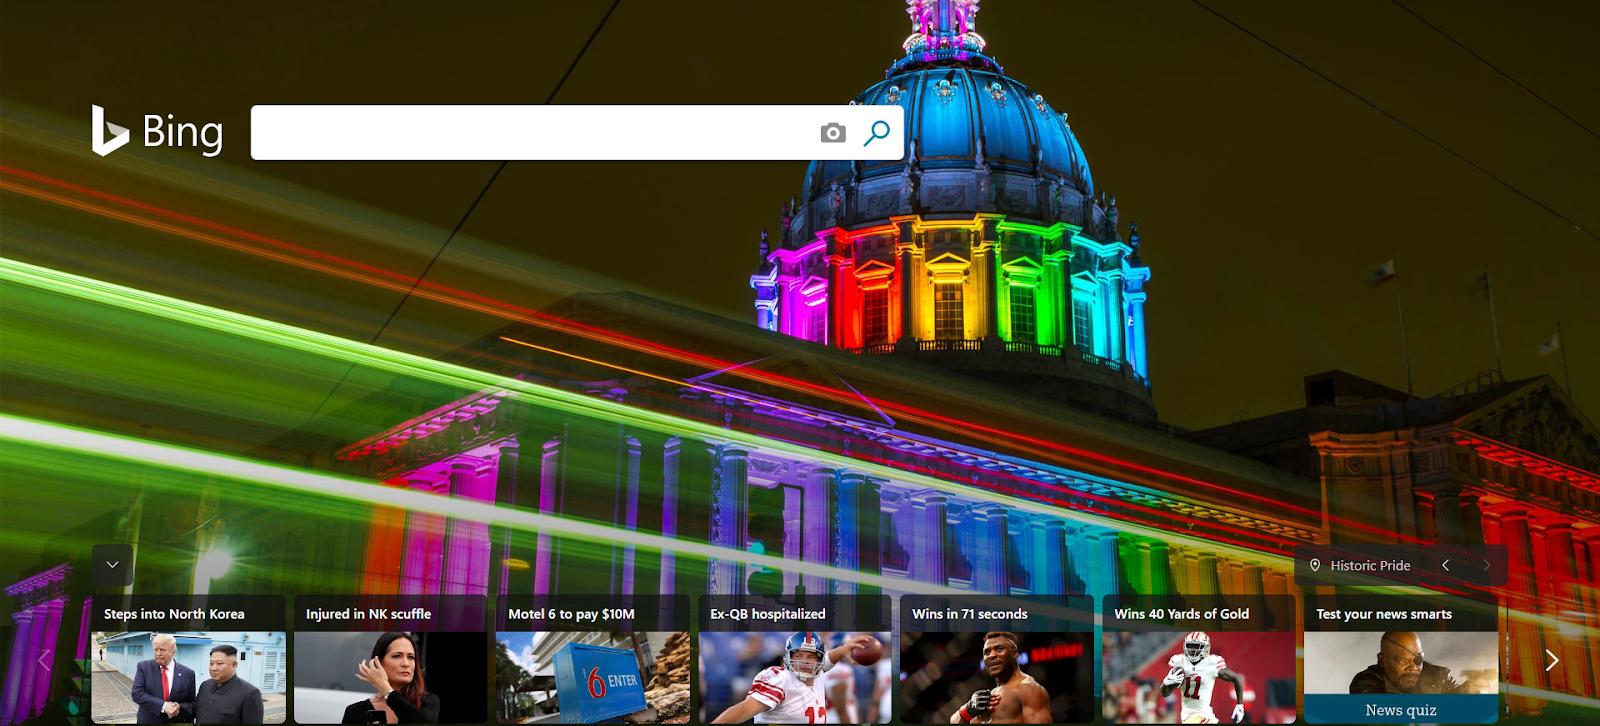 Bing's (Microsoft's search engine) main page.